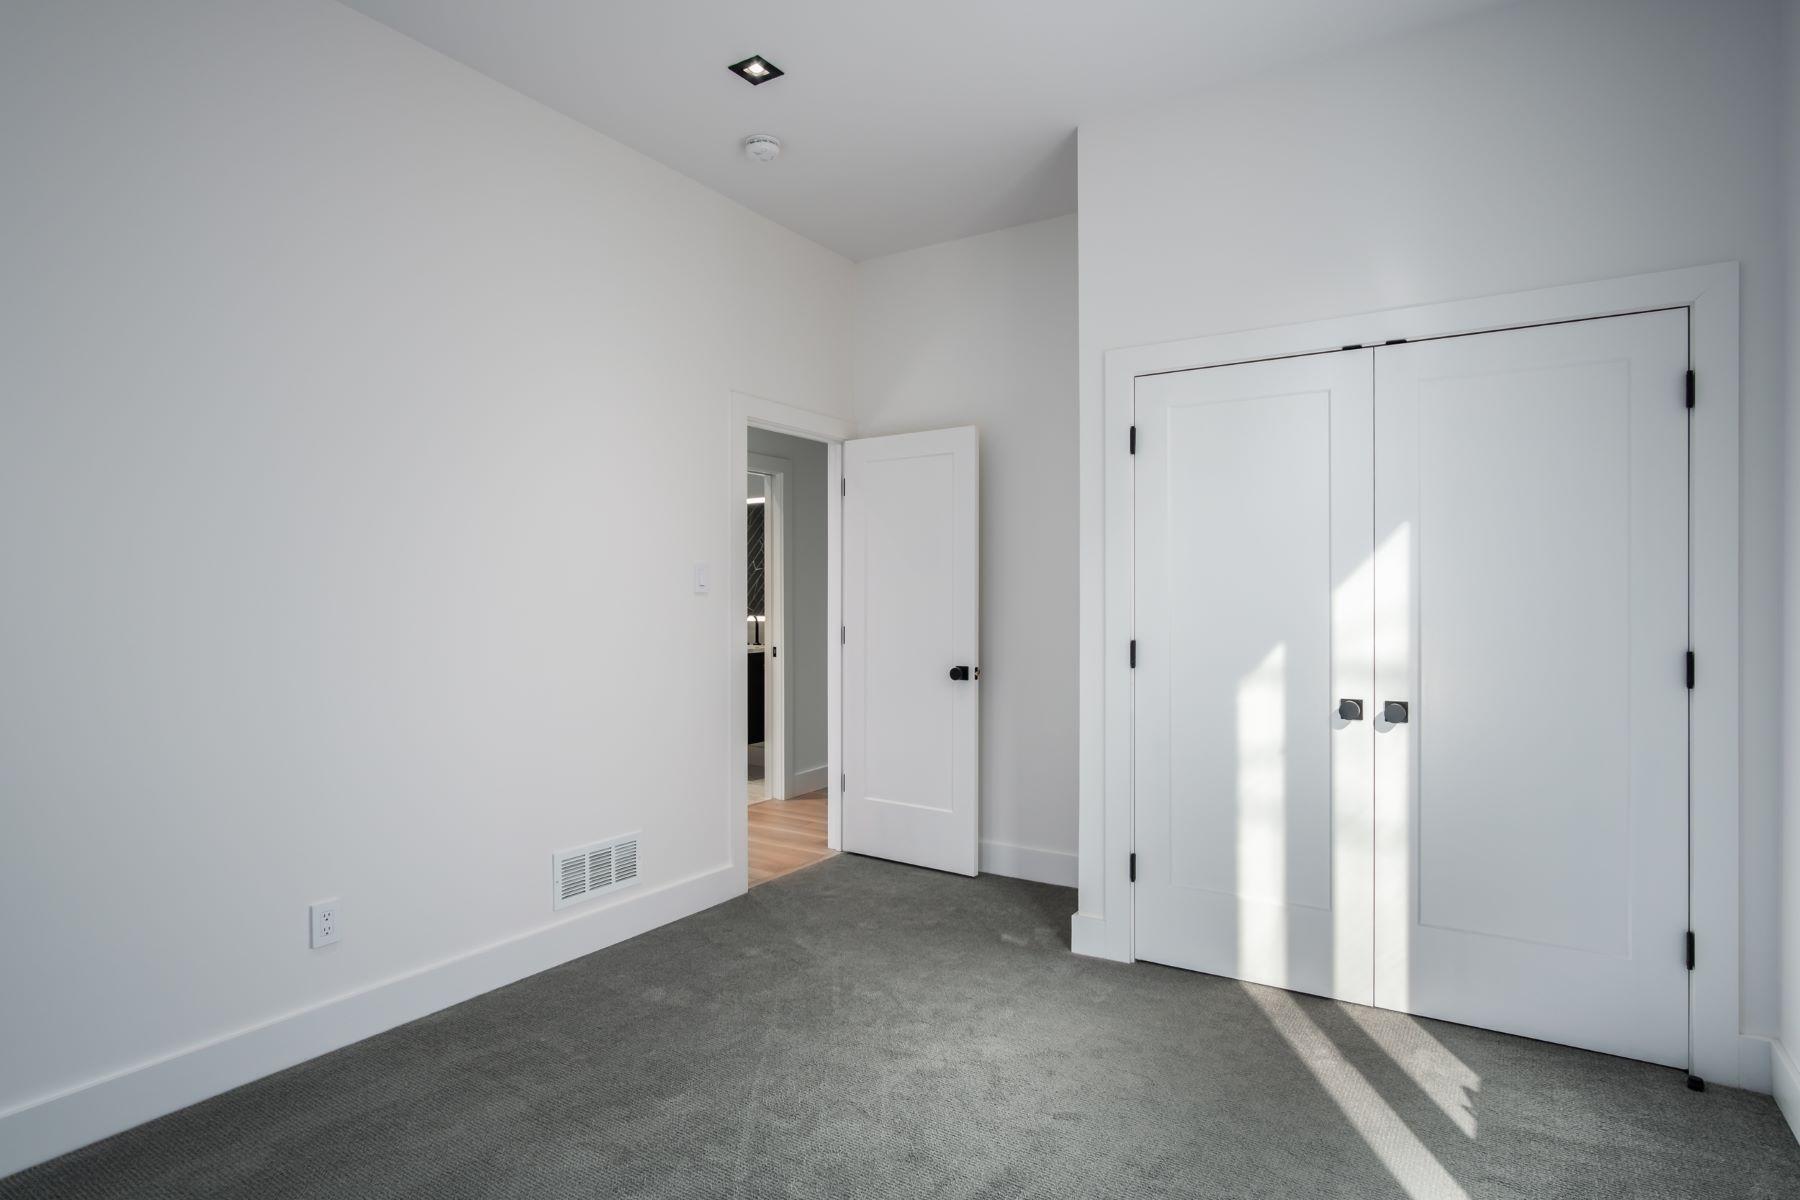 Additional photo for property listing at Breathtaking Clayton Condo 202 North Brentwood Boulevard #1C Clayton, Missouri 63105 United States